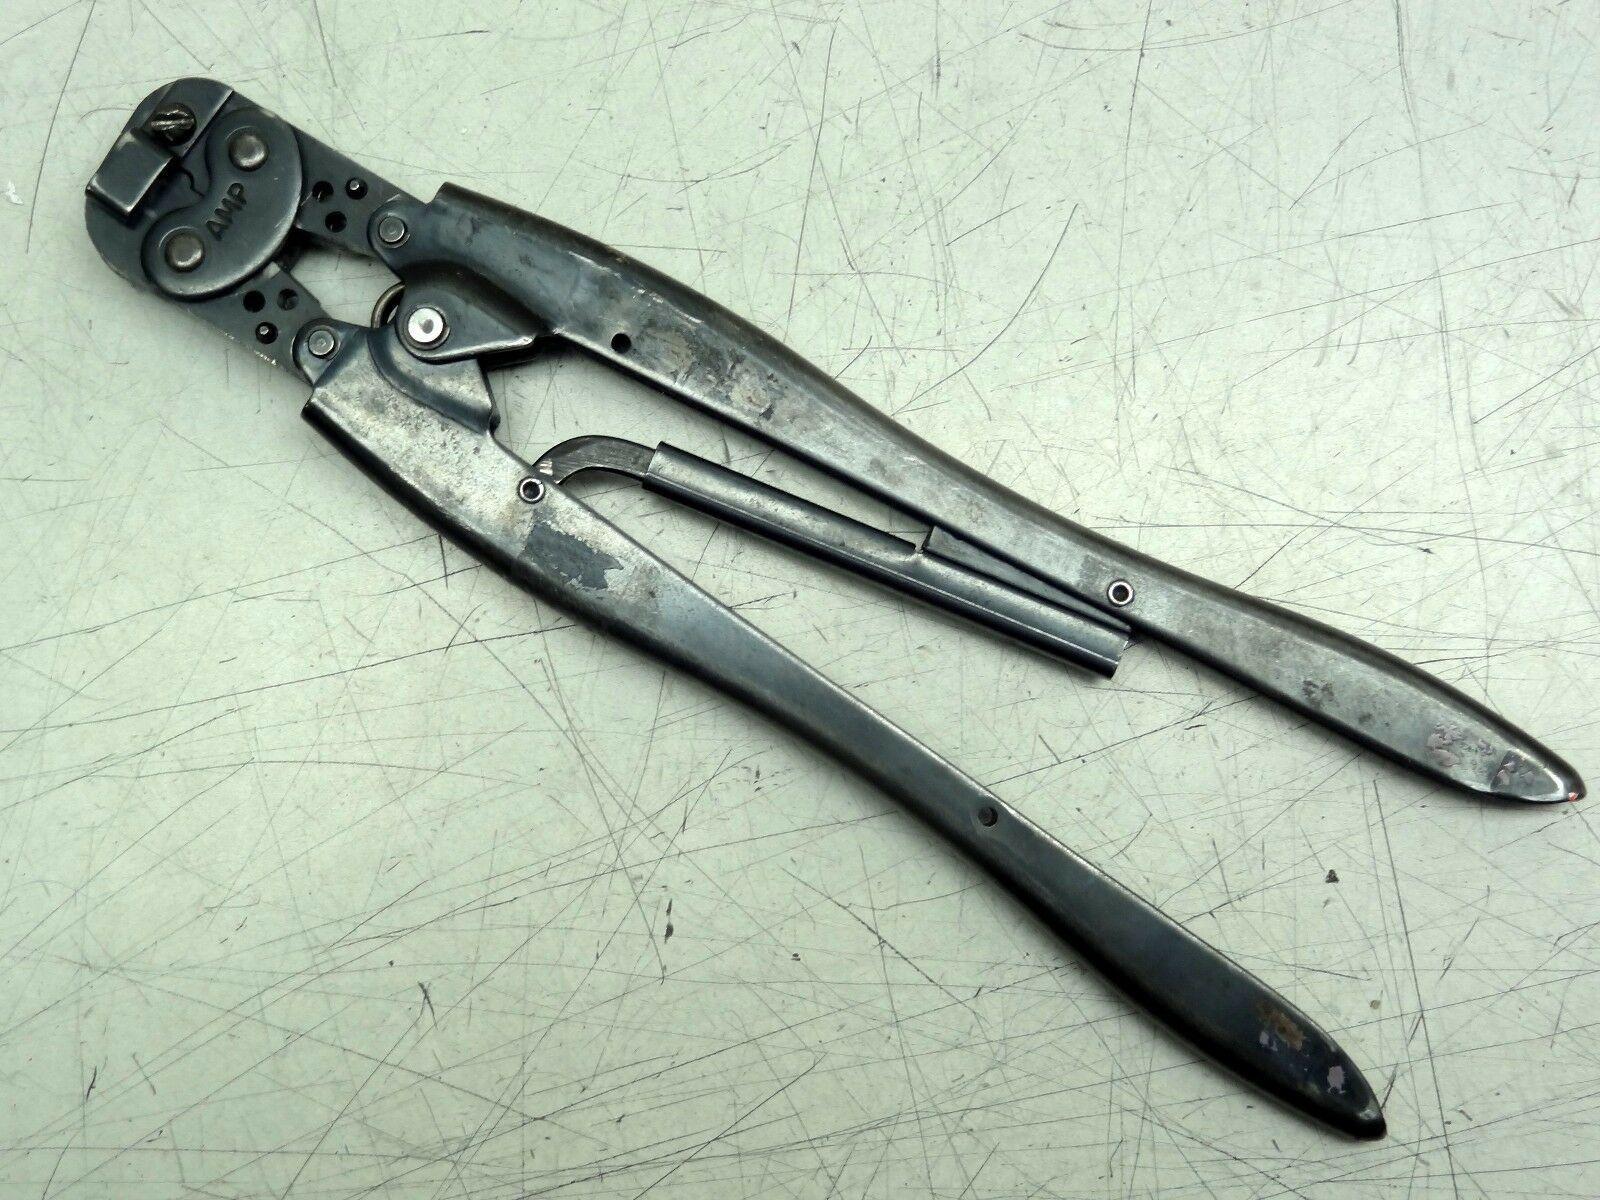 Amp Tyco 48087 Ratchet Hand Crimper / Crimping Tool 22-14 AWG AD E.C.V.